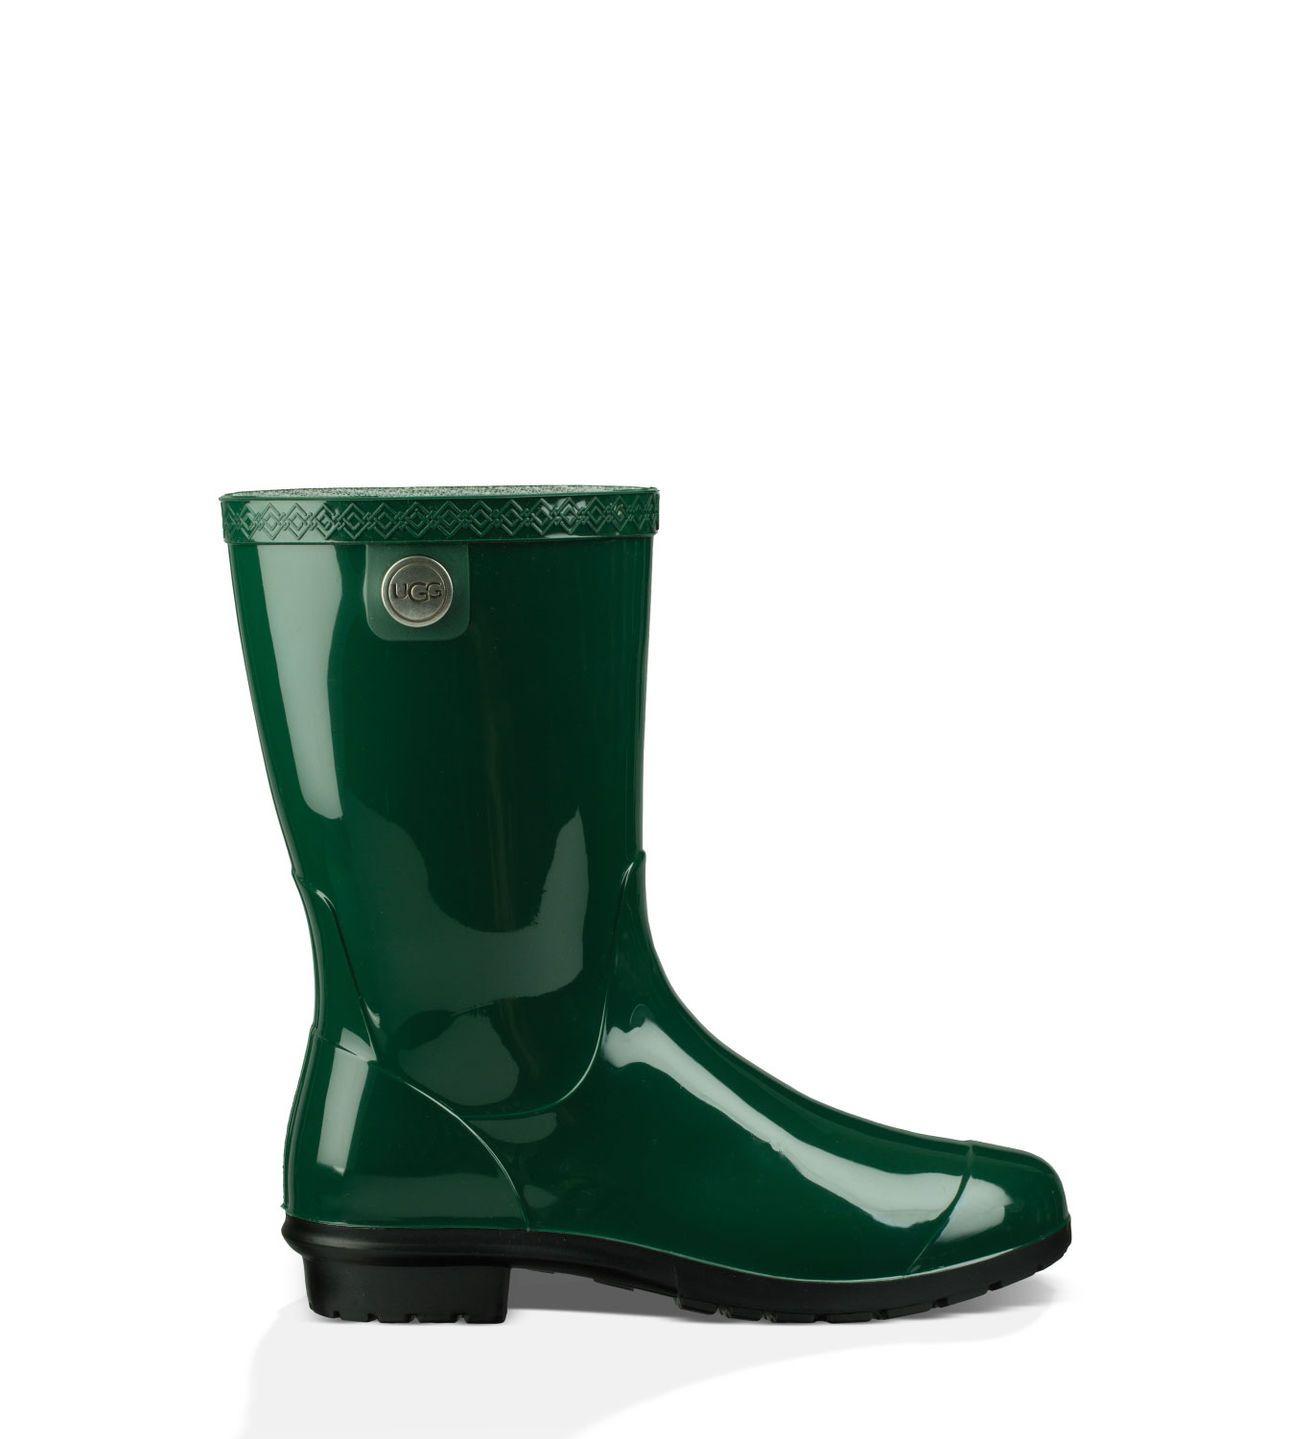 2d94137631e Women's Share this product Sienna Rain Boot   Green Envy ...